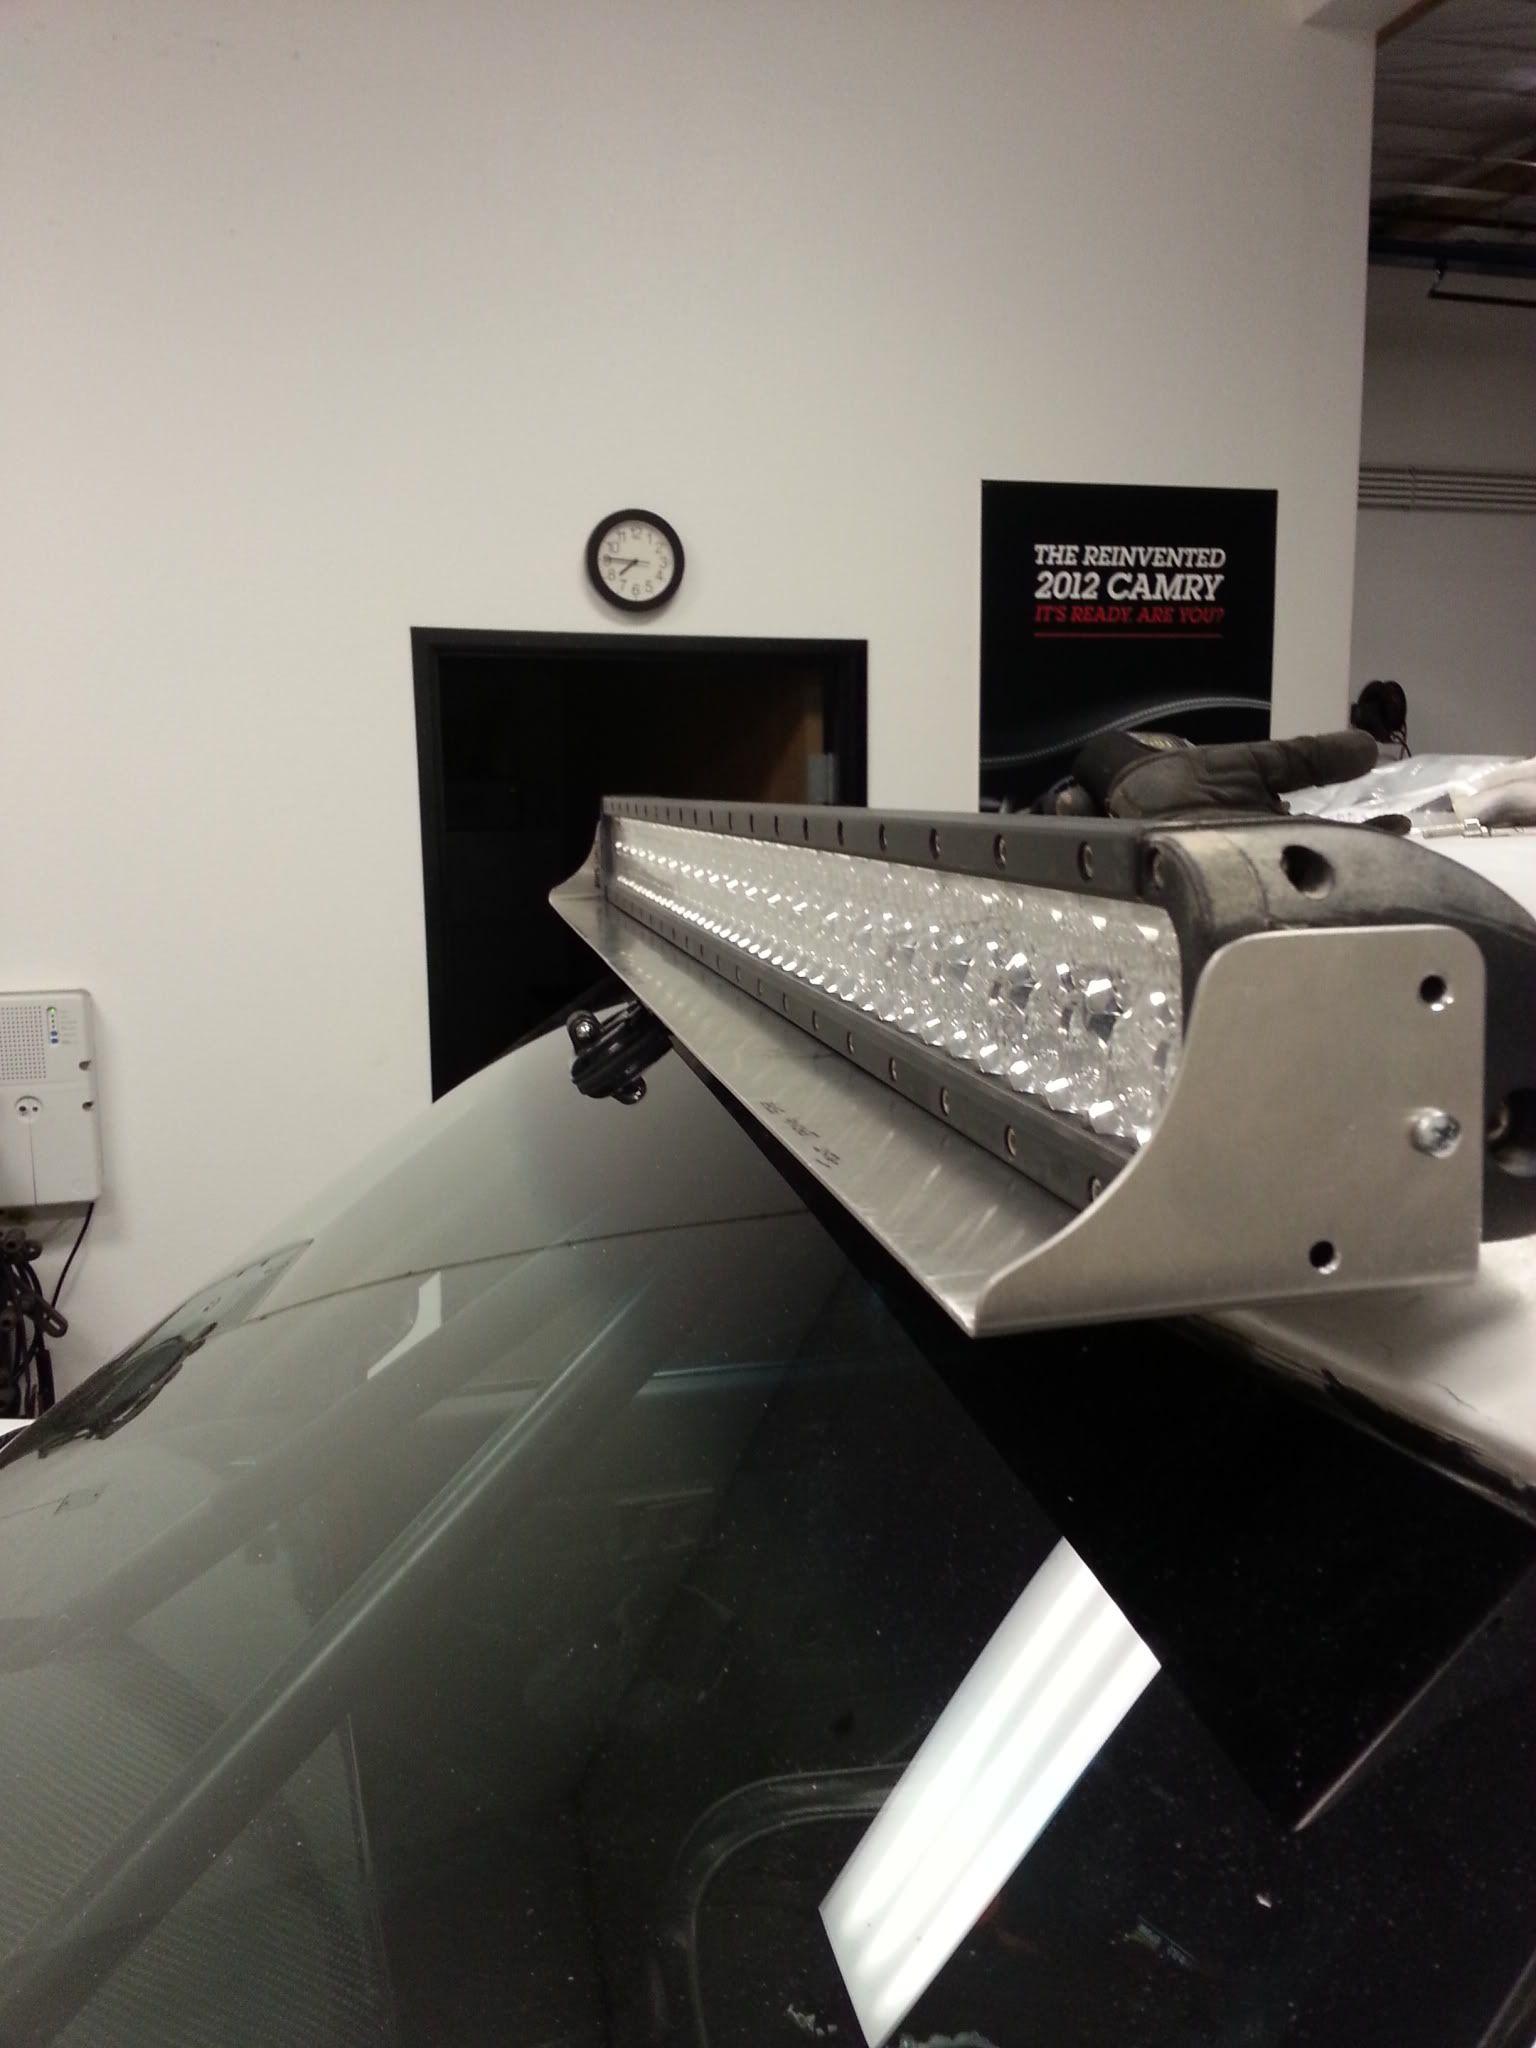 Led Light Bar Glare Elimination By Using Deflector The